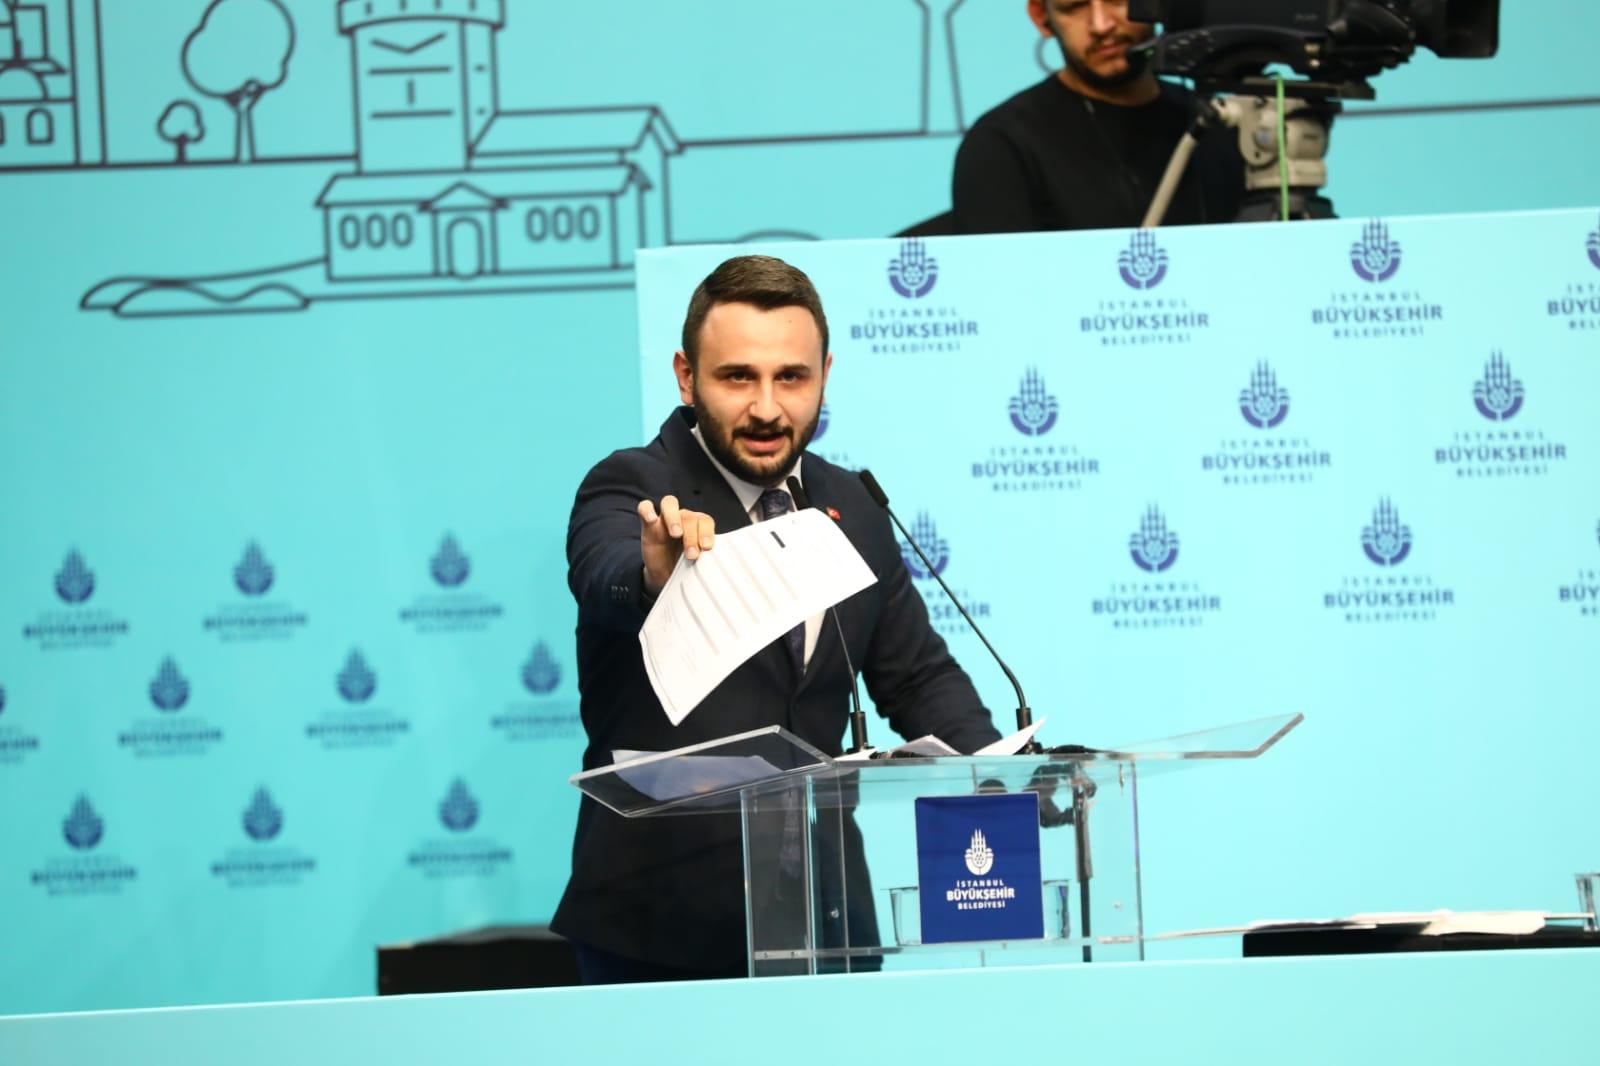 AK Parti İBB Meclis üyesi Erdem Kertişçi'den, TÜGVA'ya hukuksuzca baskın yapan CHP'li İBB'ye çok sert tepki